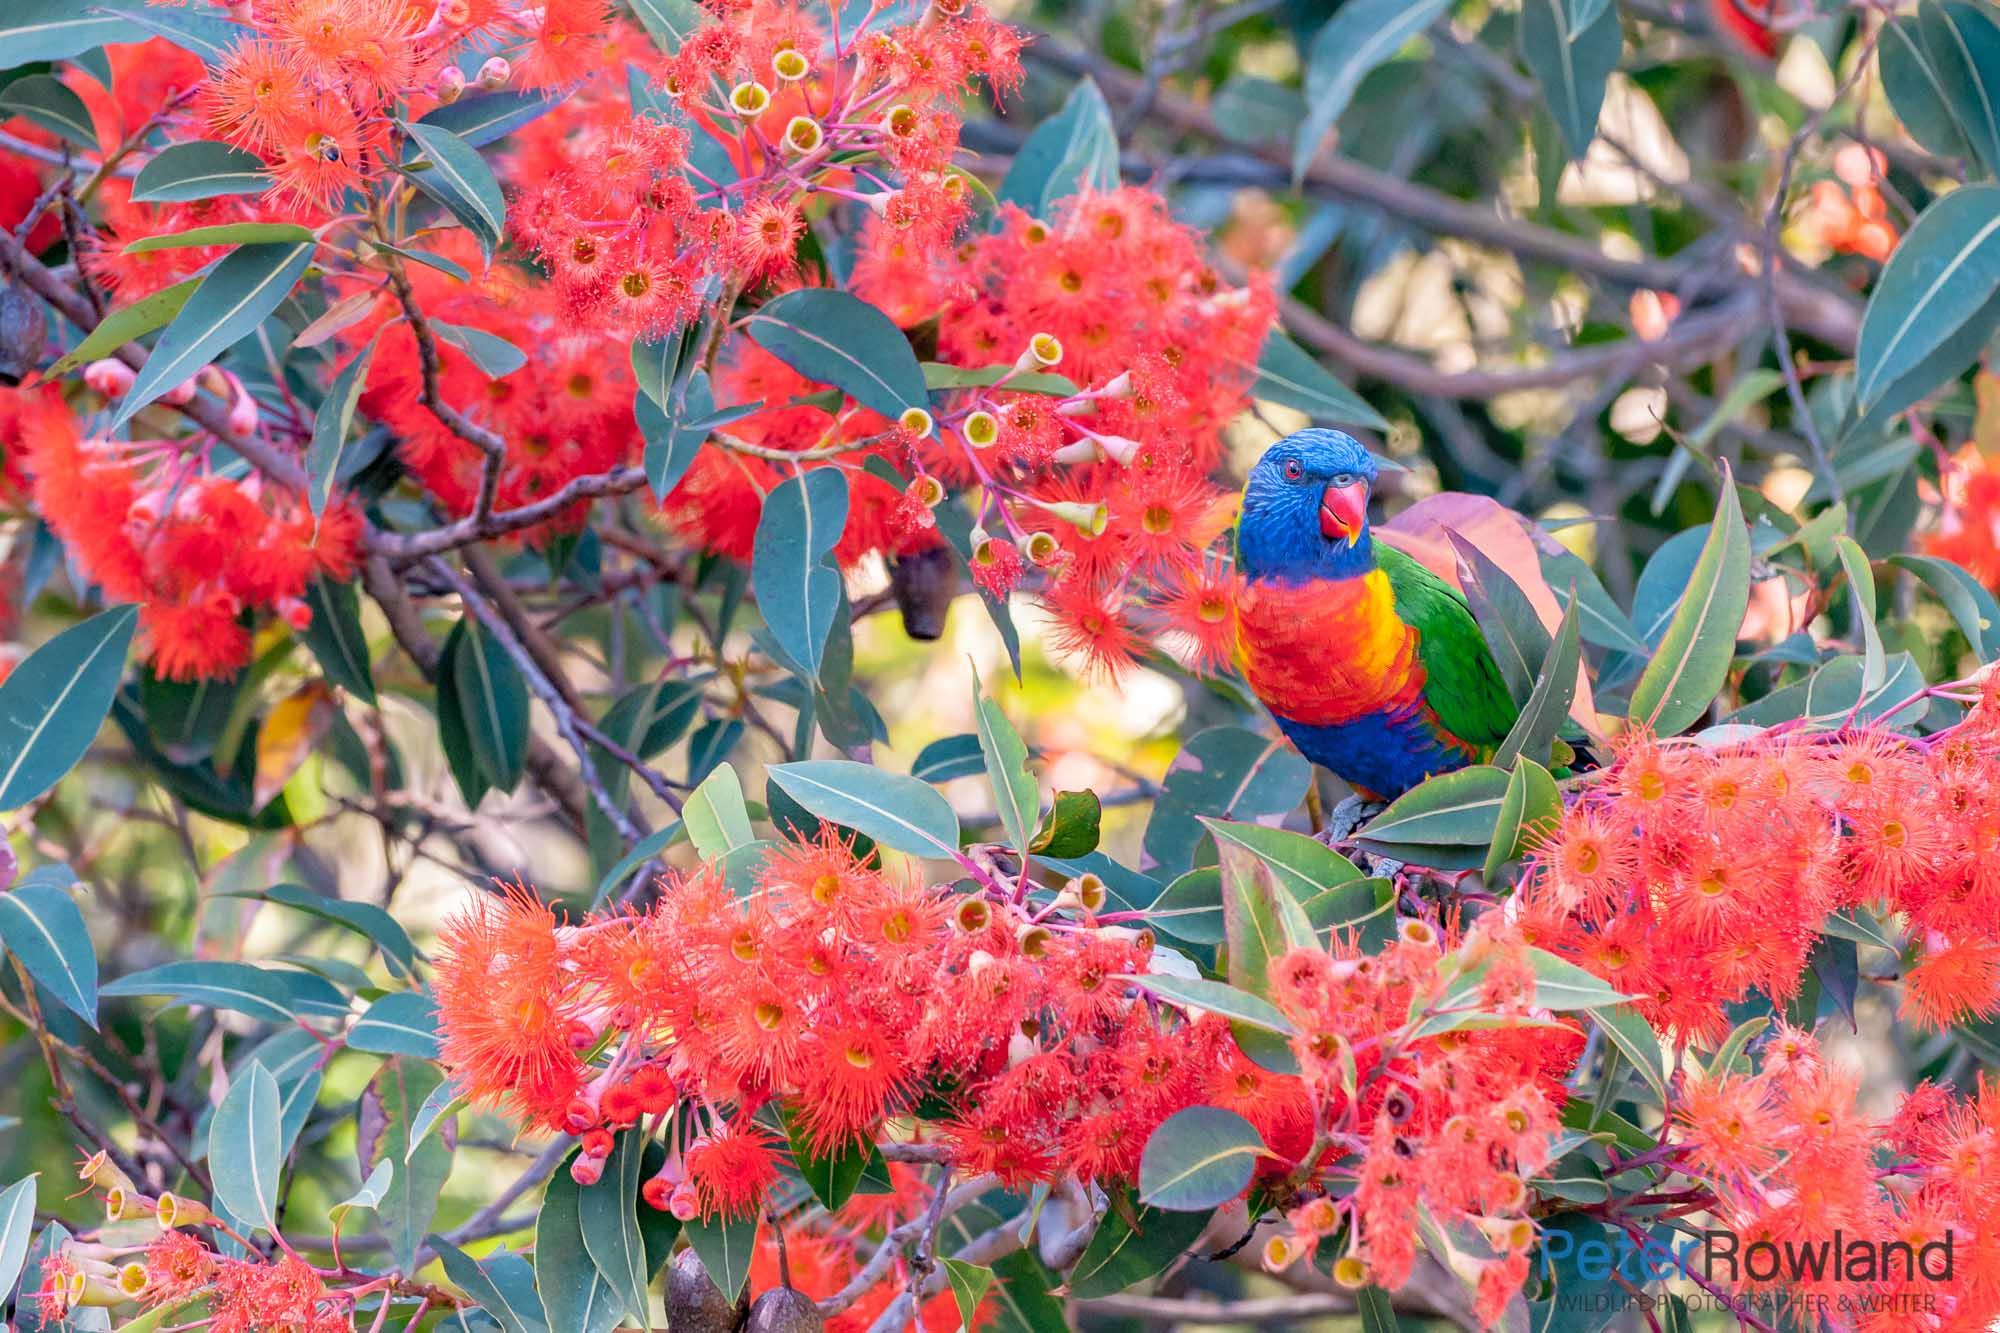 A Rainbow Lorikeet among rich red flowers